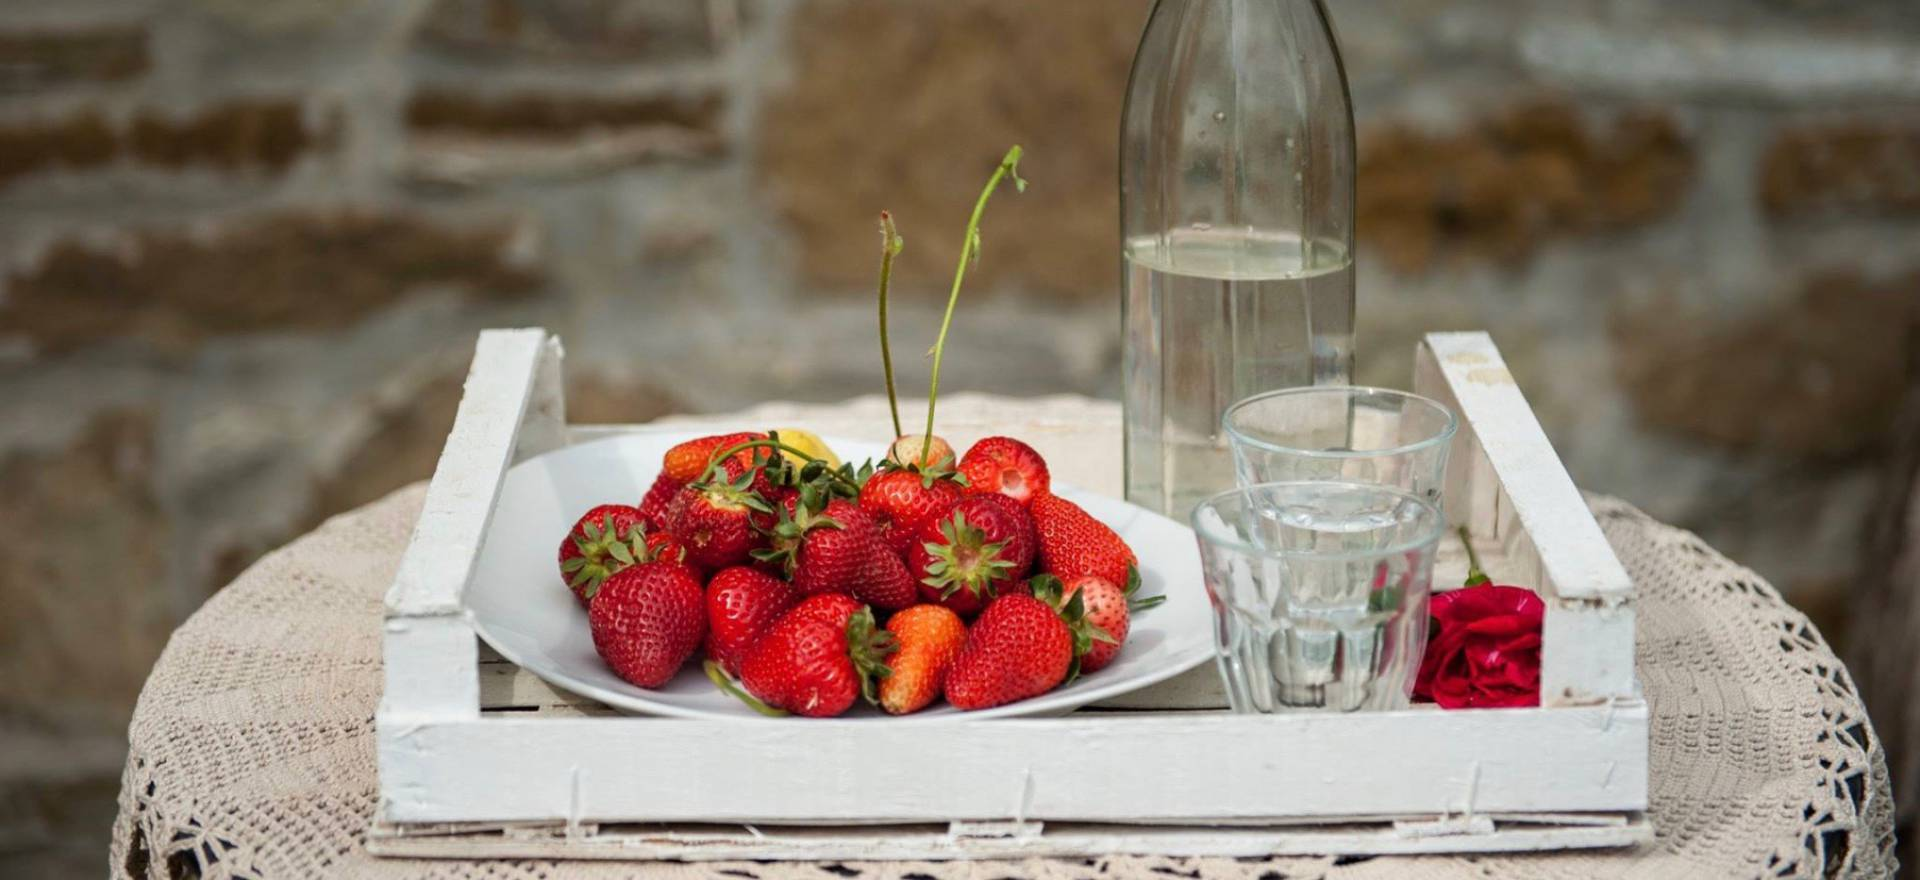 Agriturismo Toscana Agriturismo adatto ai bambini e accogliente in Toscana